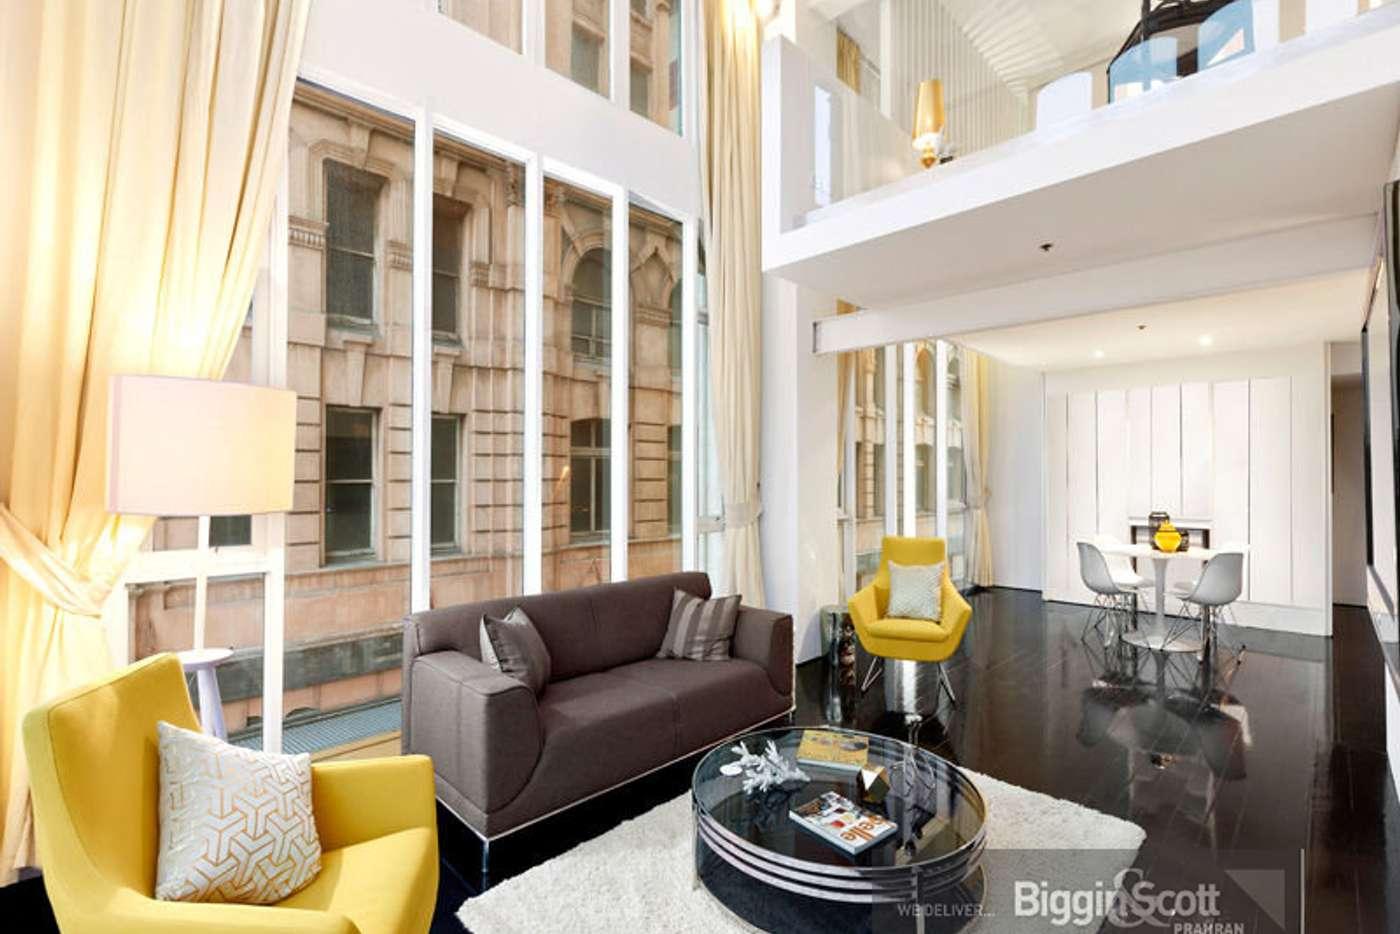 Main view of Homely apartment listing, 14/321 Chapel Street, Prahran VIC 3181